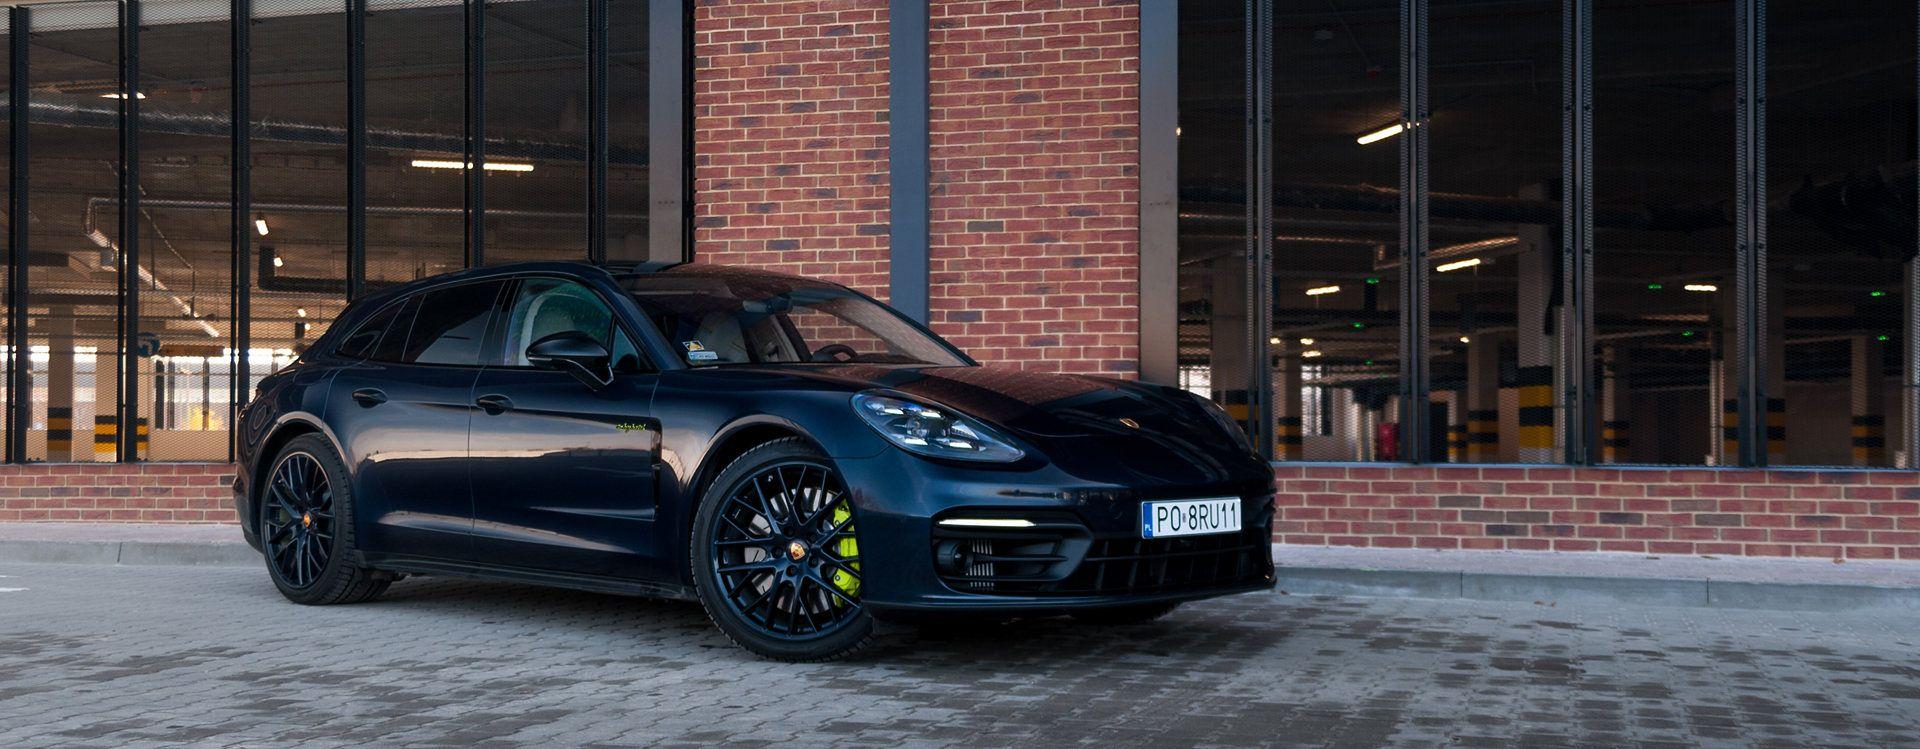 Porsche Panamera 4S E-Hybrid Sport Turismo (2020)